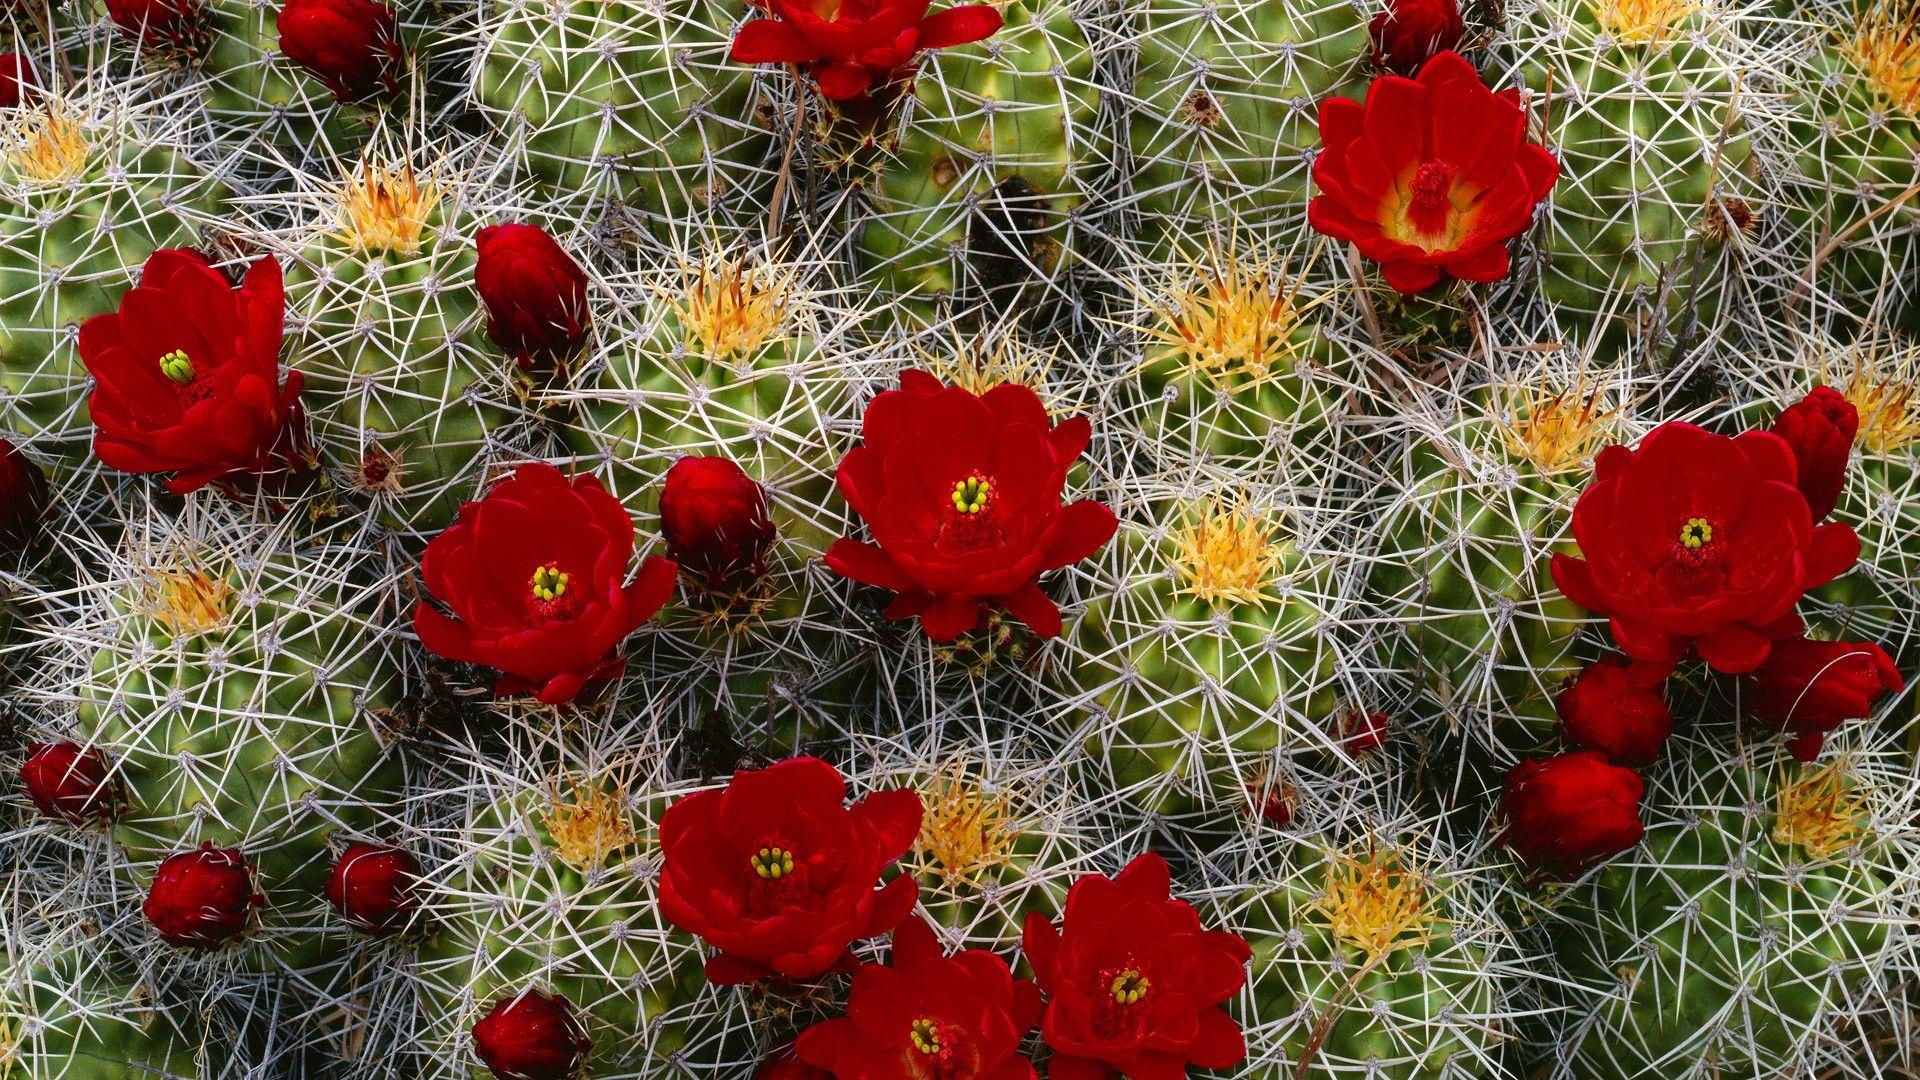 Cactus background wallpaper